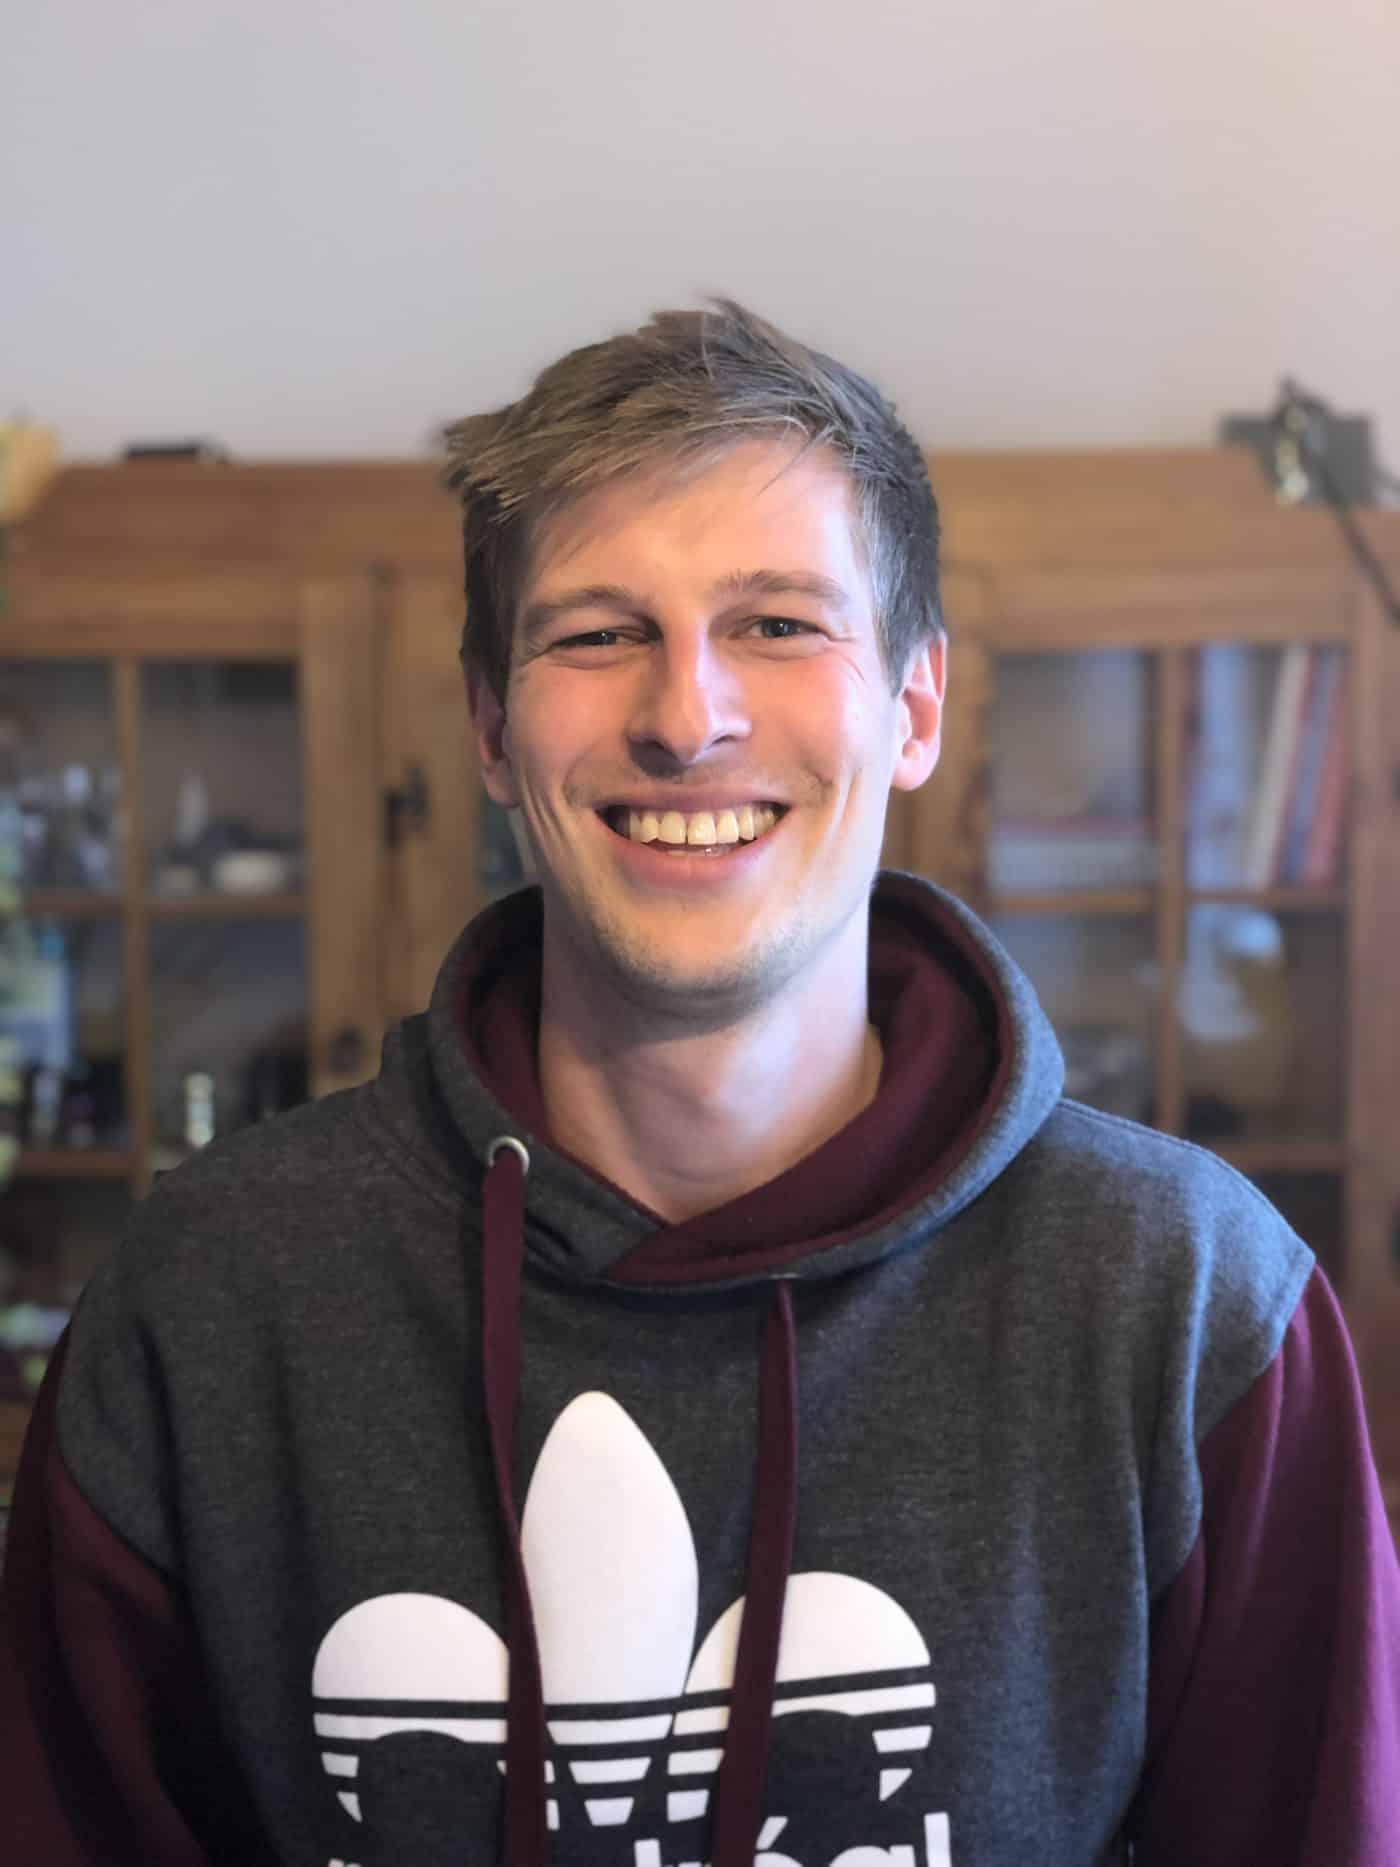 Carsten P.